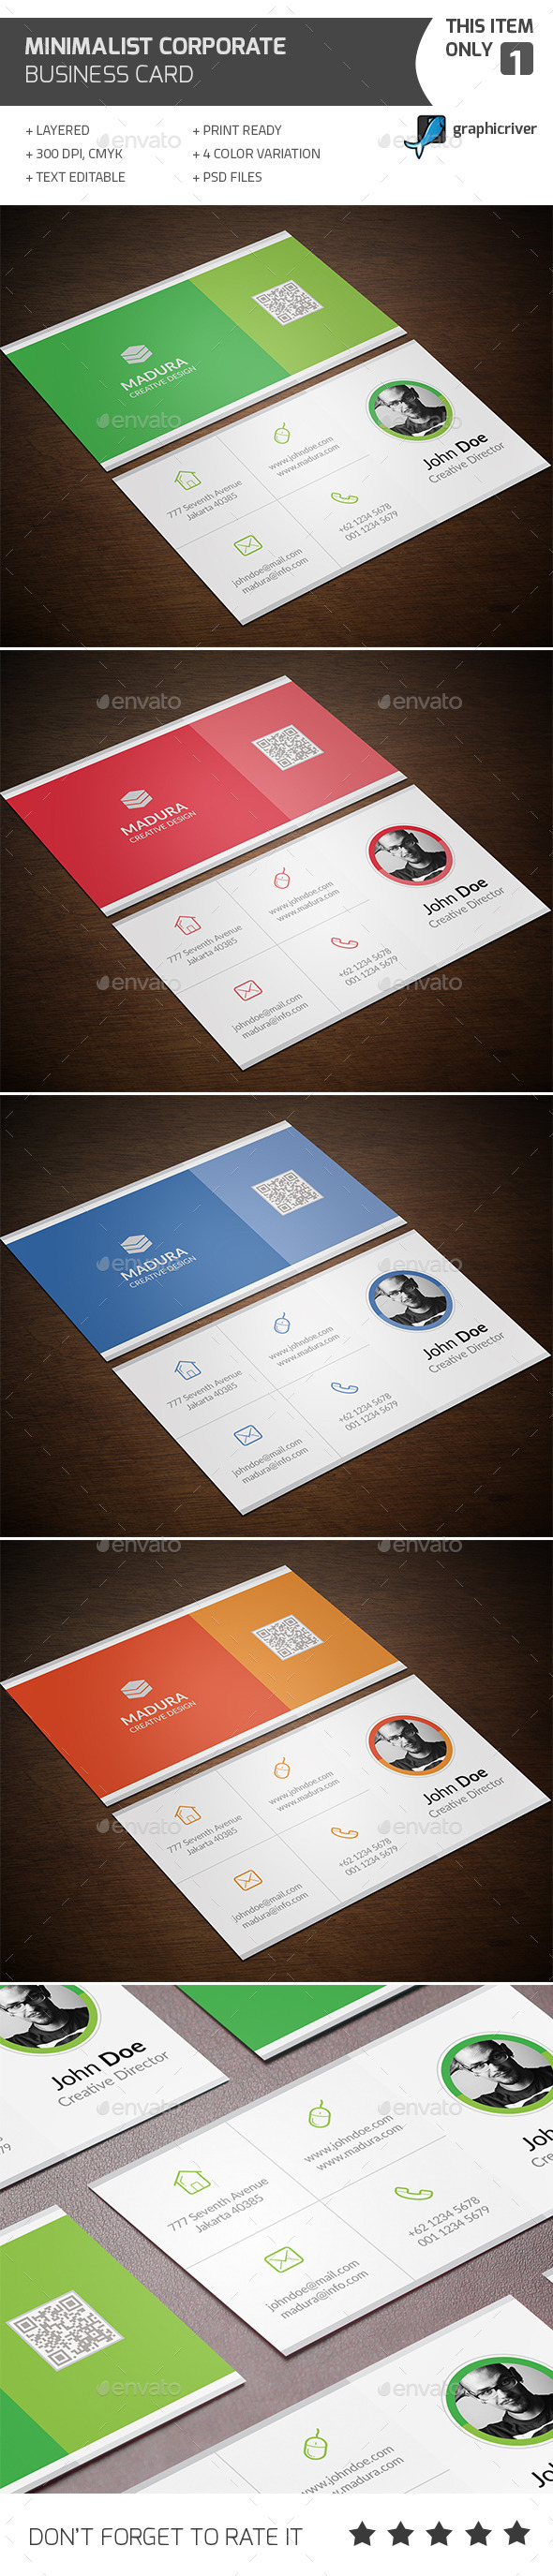 Minimalist Corporate Business Card - Corporate Business Cards